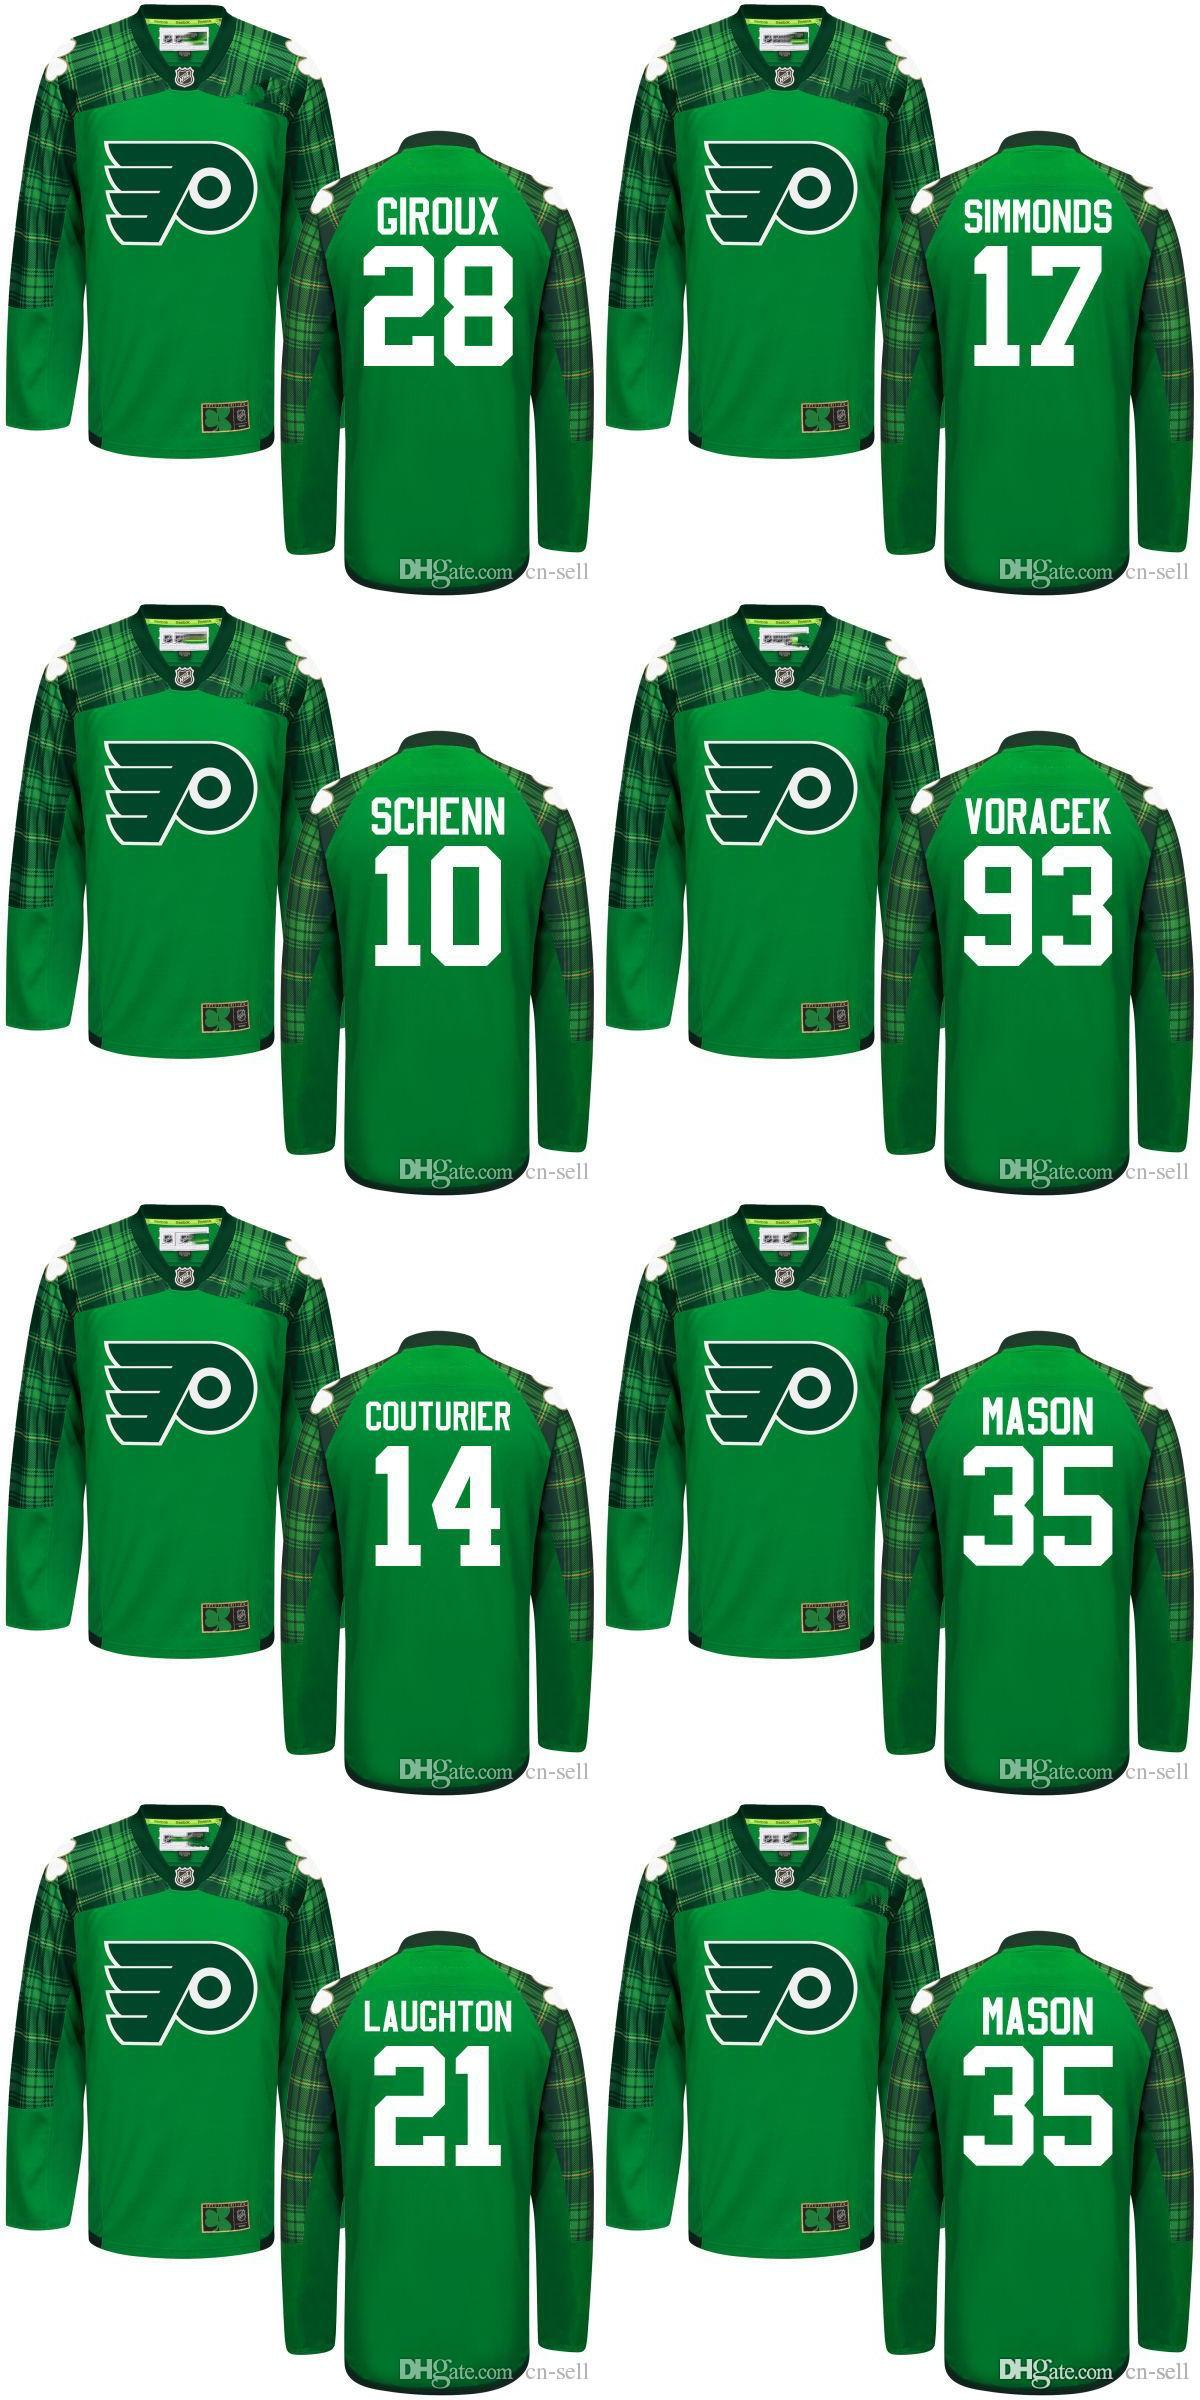 ... St. Patricks Day Green Jersey 2016 Men Philadelphia Flyers 14 Couturier  93 Voracek 10 Schenn 17 Simmonds 21 Laughton 28 Giroux ... 462086bc4